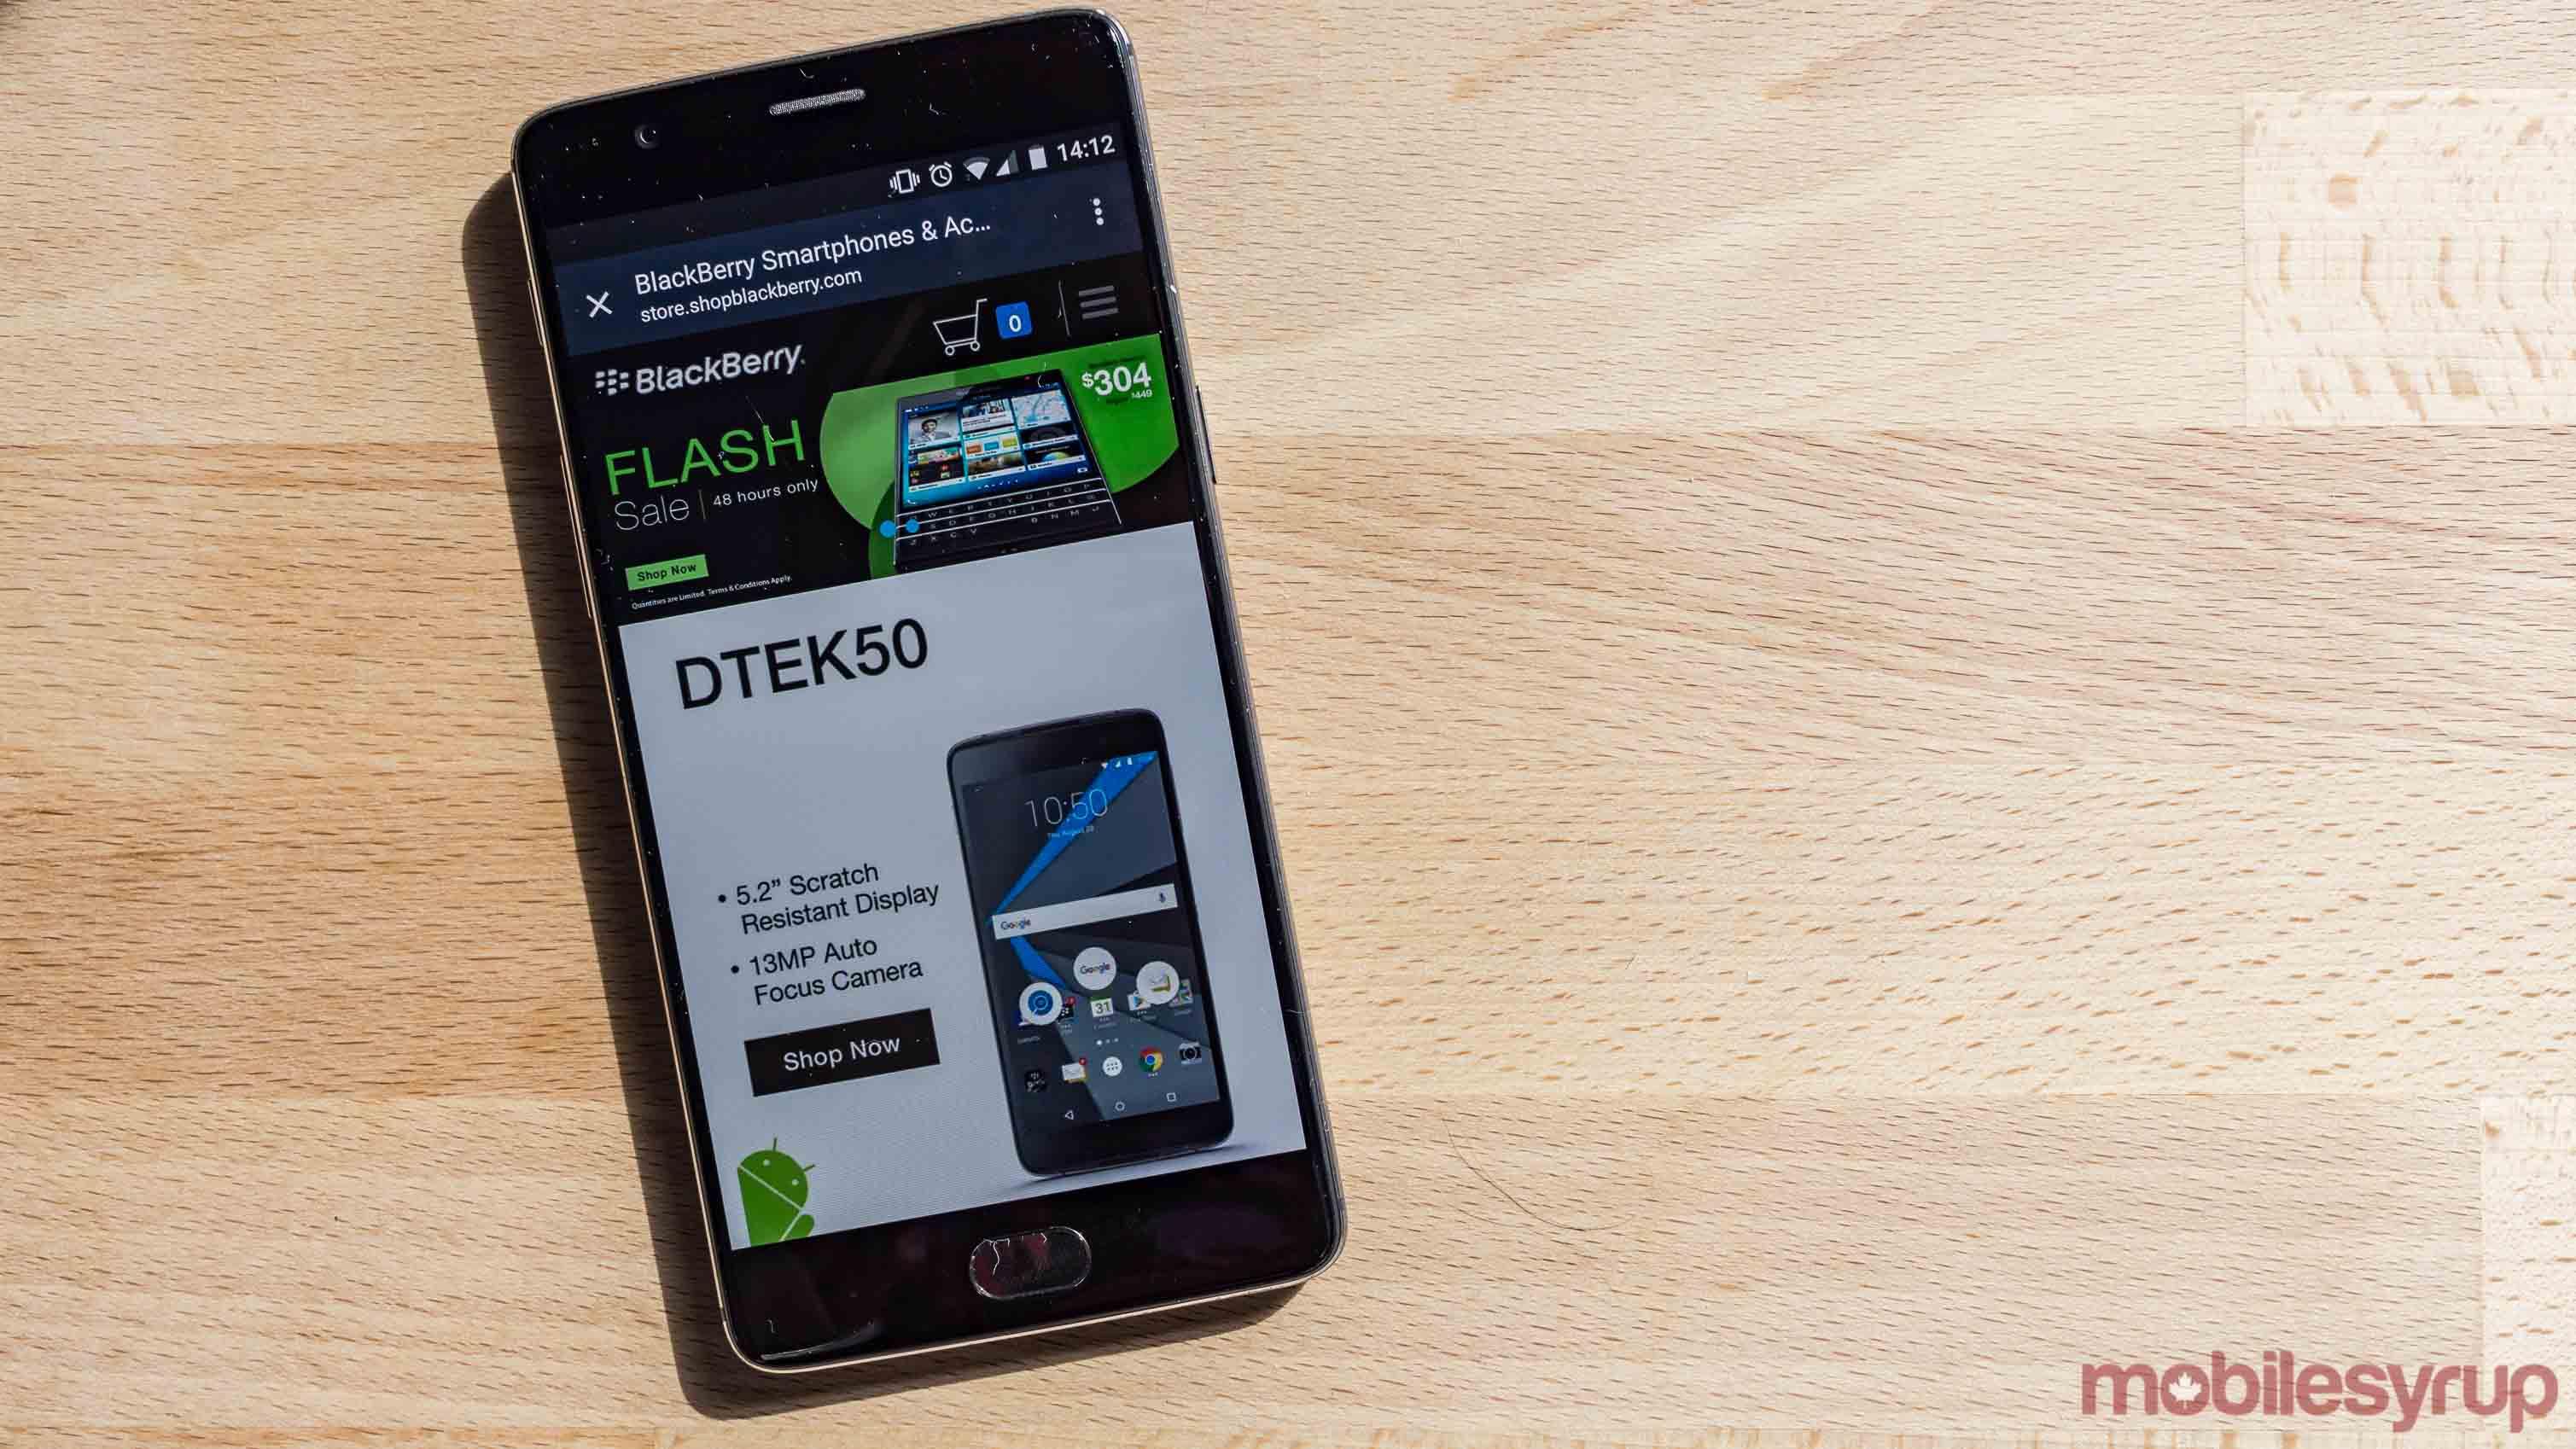 BlackBerry discounts DTEK60, DTEK50 and other devices for 24